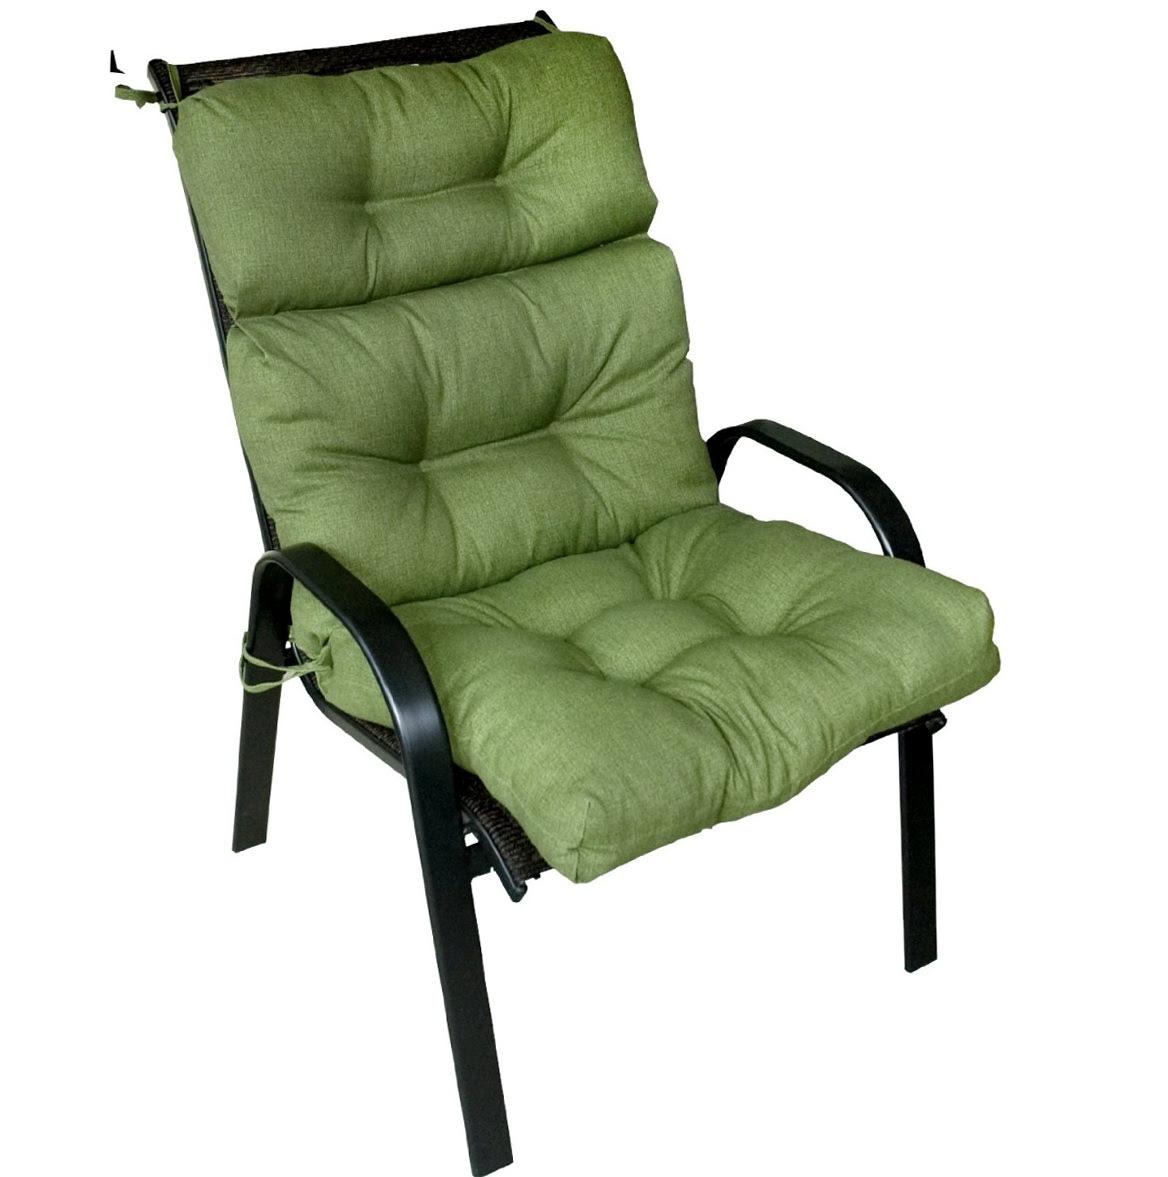 Patio Furniture Seat Cushions Clearance | Home Design Ideas